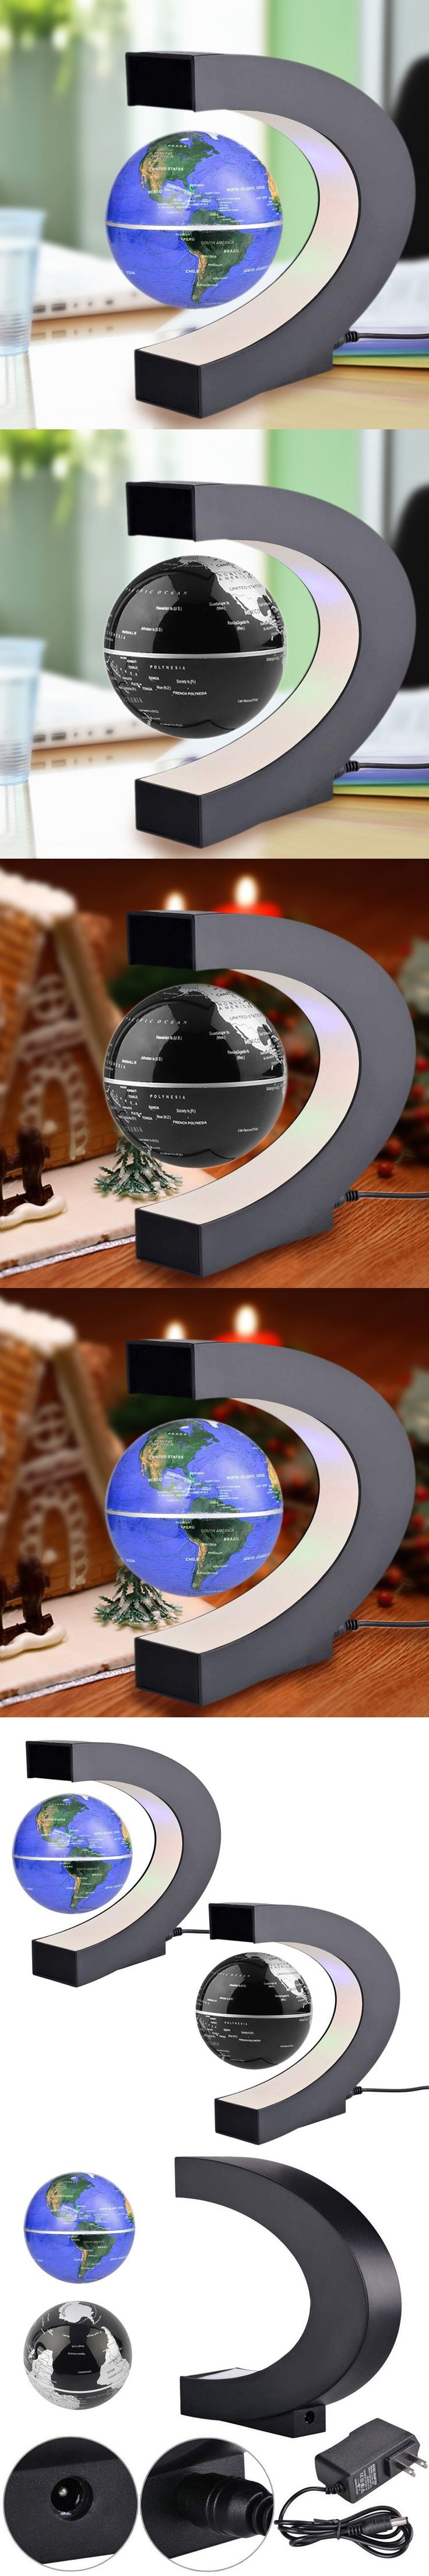 Best Magnetic Levitation Ideas On Pinterest Cool Science - Home magnetics us map